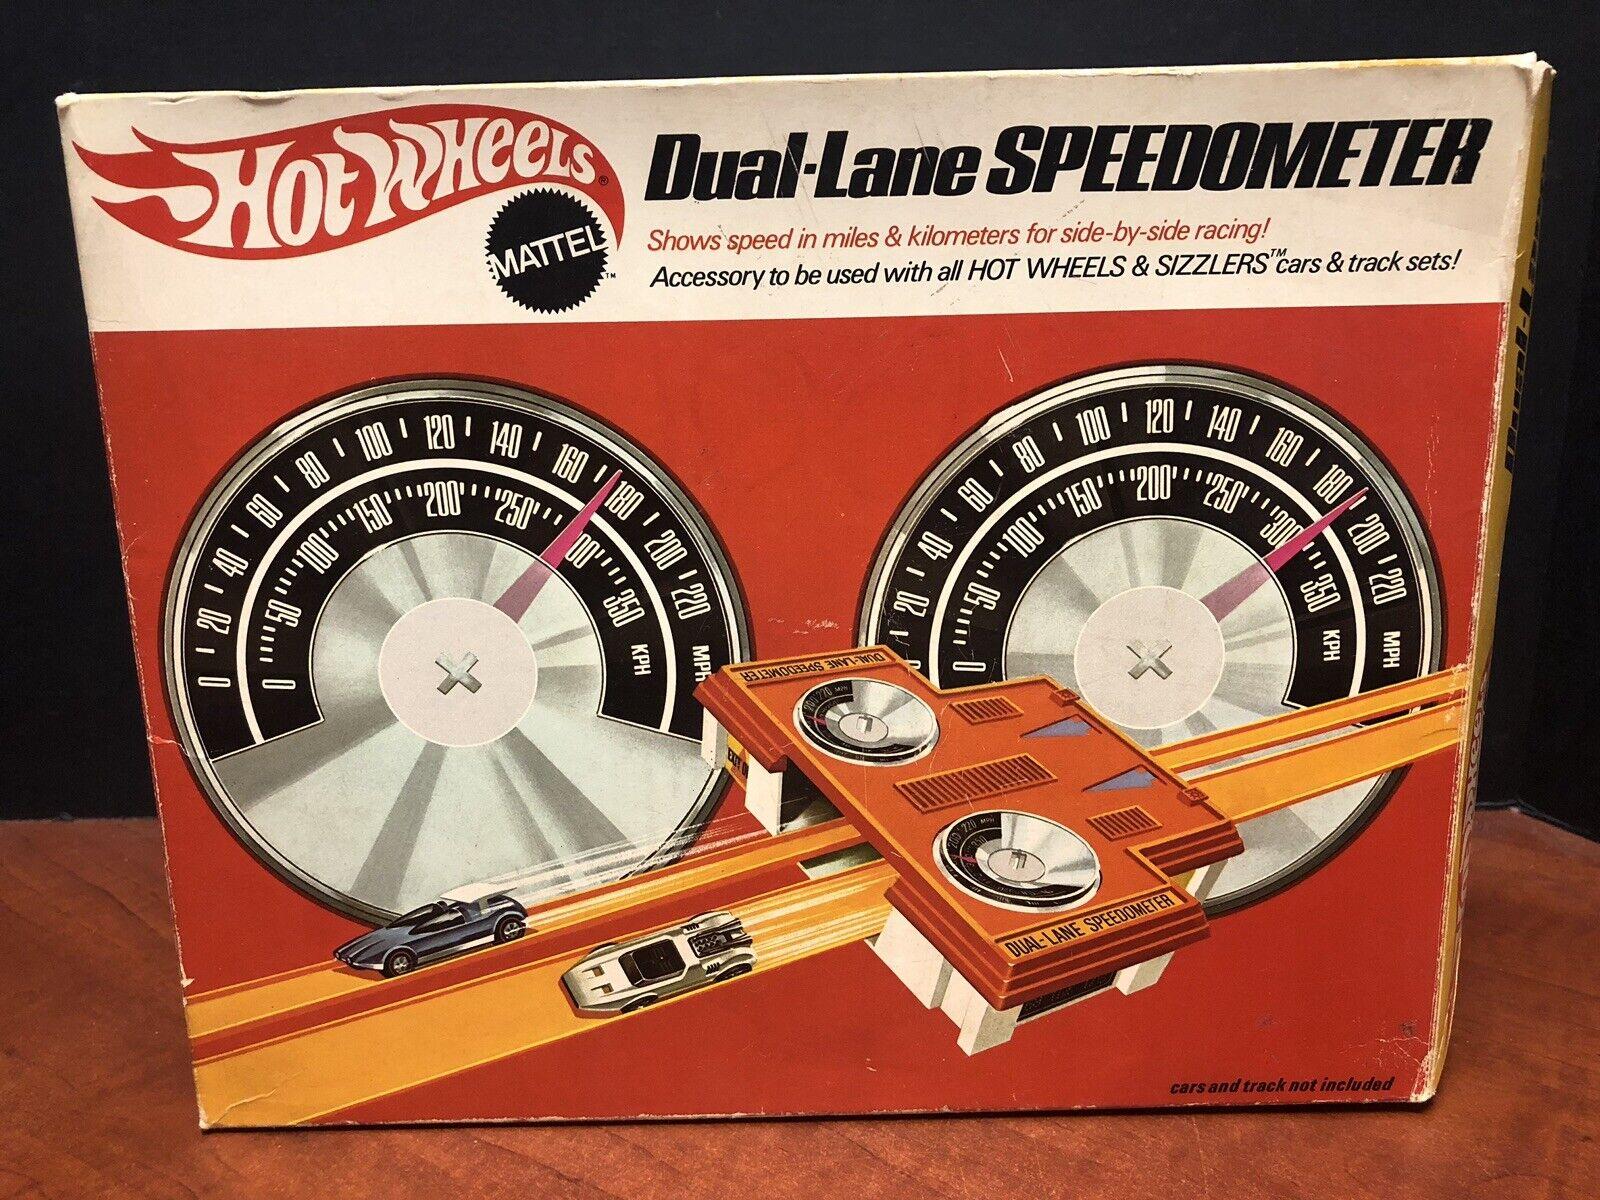 Hot Wheels Vintage 1969 Dual-Lane Speedometer With Box EM2694